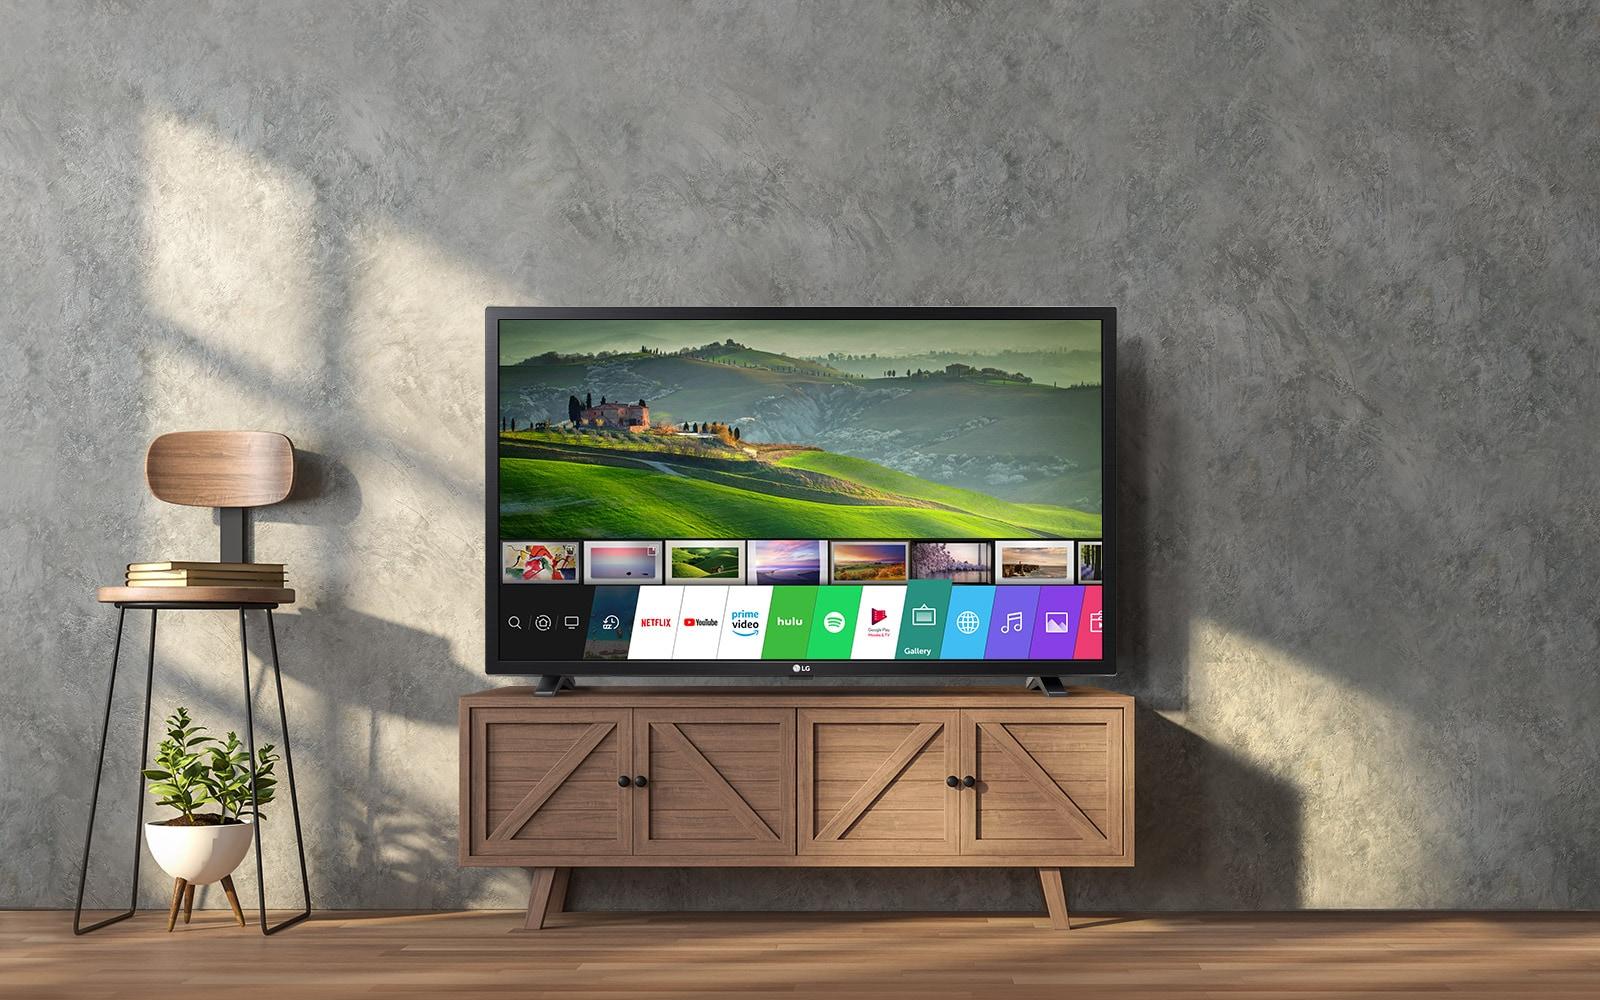 TV-FHD-43-LM63-08-webOS-Smart-TV-Desktop